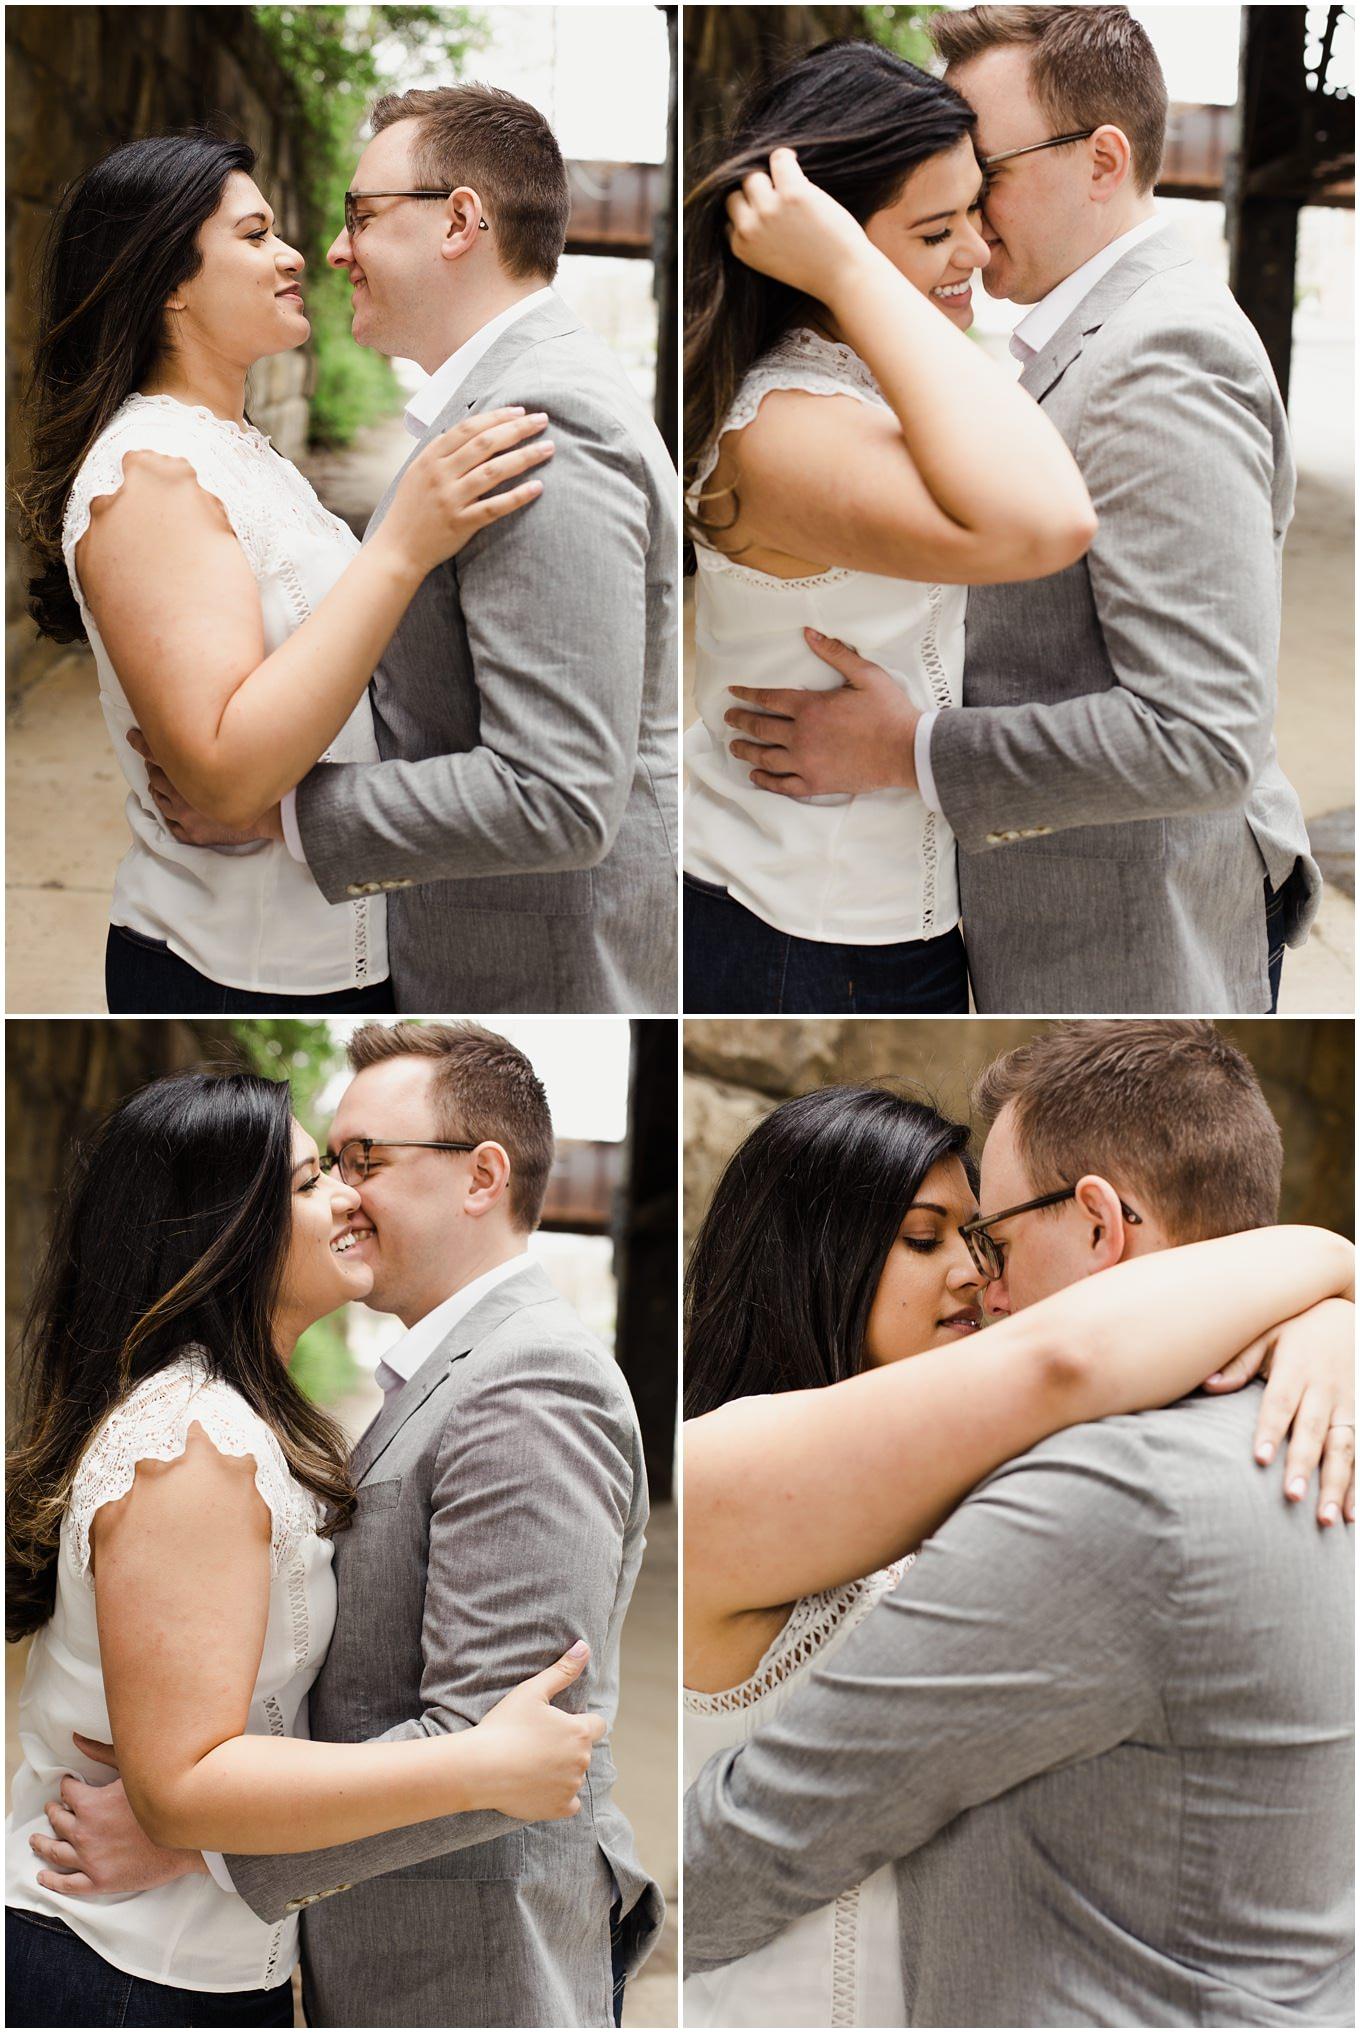 adam lowe photography, wedding, bride and groom, engagement session, columbus, ohio, style, modern, fine art wedding, fashion, stylish, photography, photography